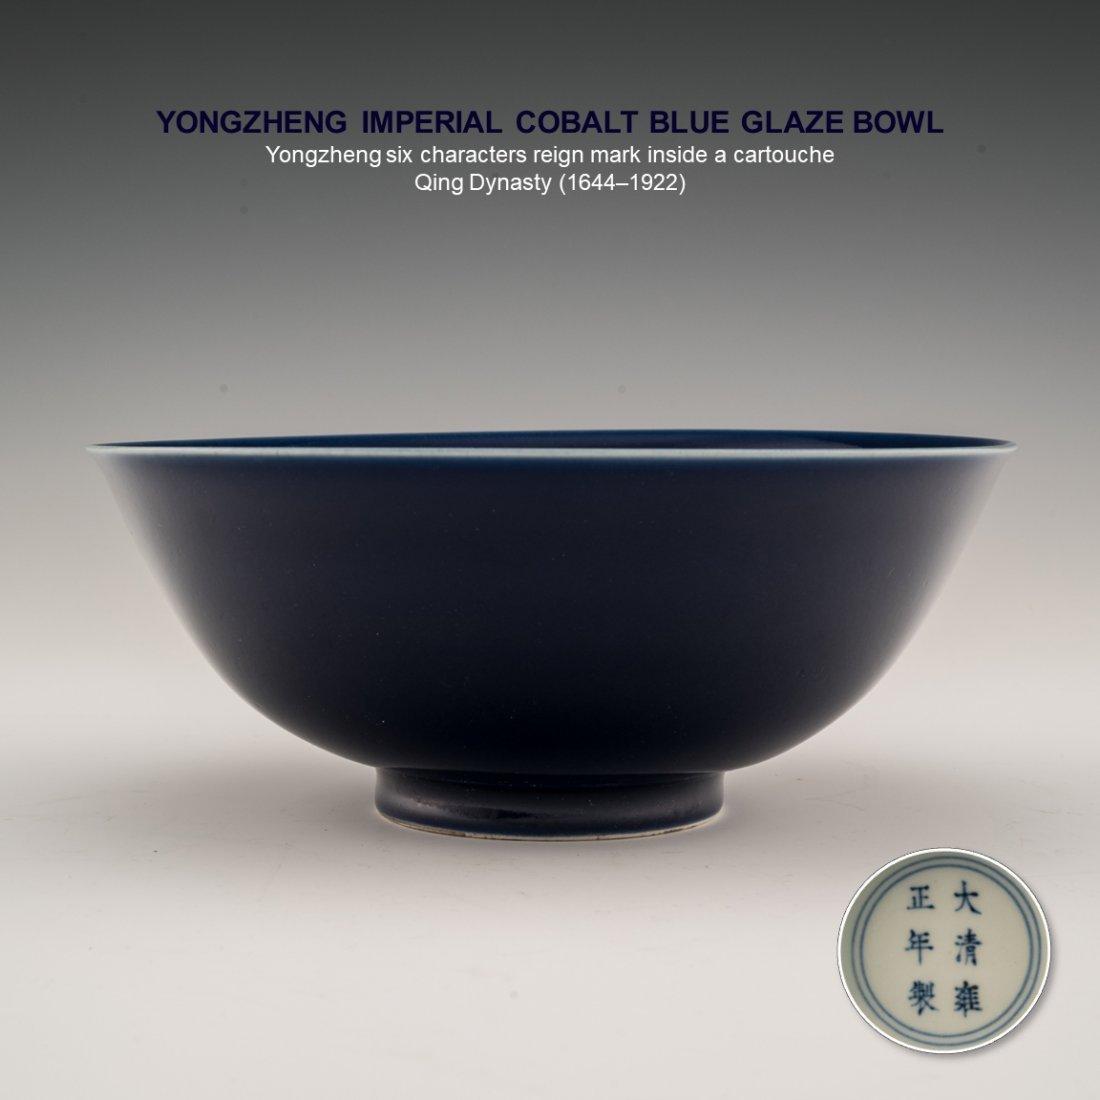 YONGZHENG IMPERIAL COBALT BLUE GLAZE BOWL